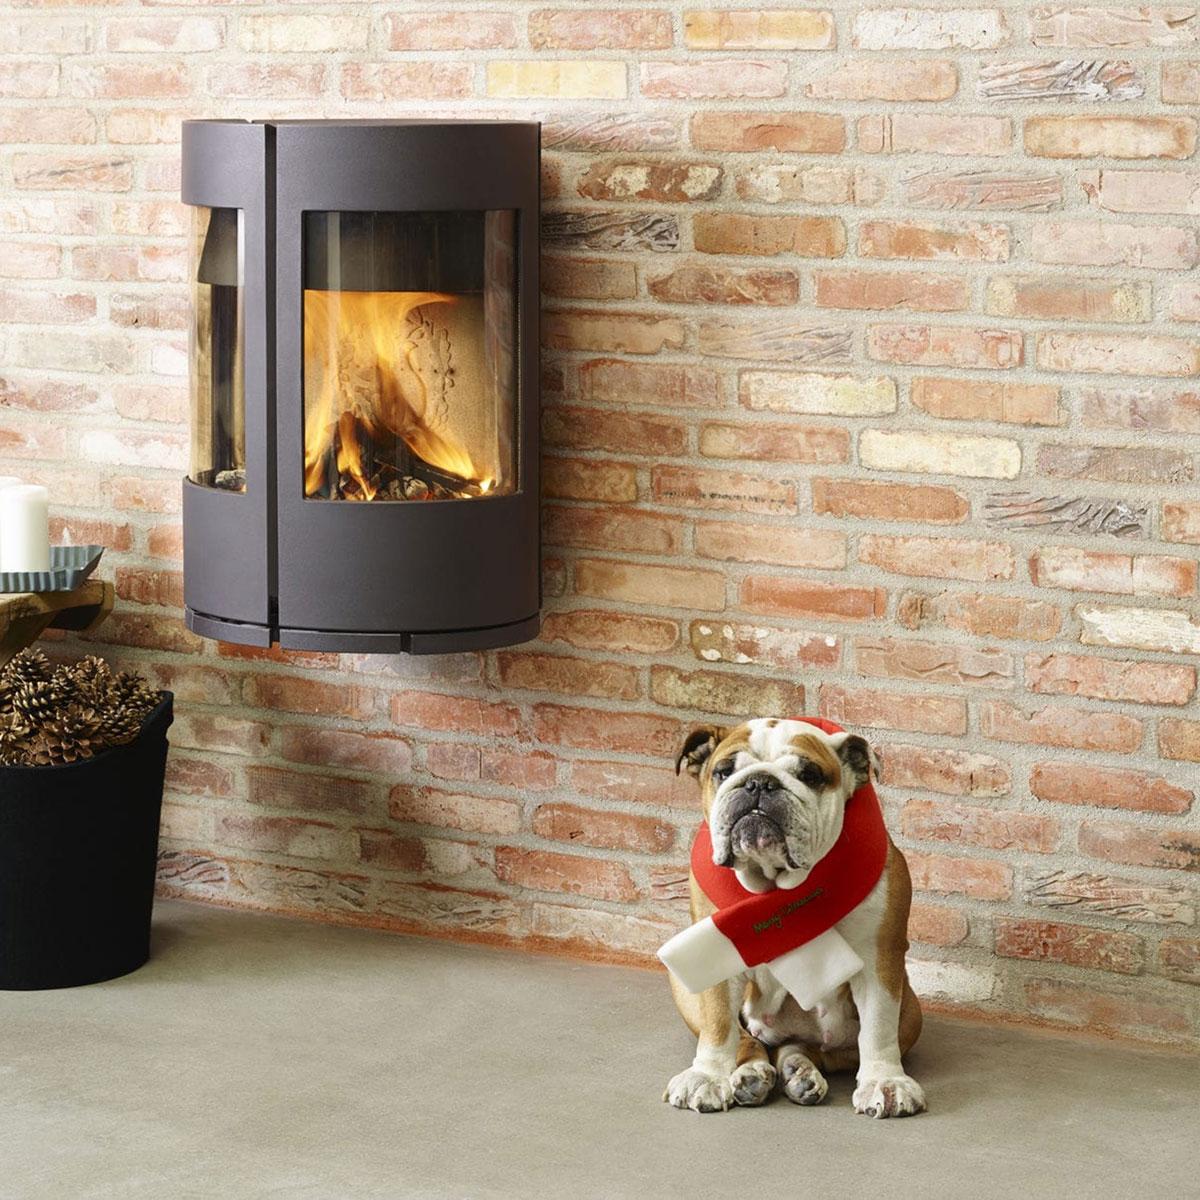 Morso 6670 wall hung wood heater with bulldog sitting next to it